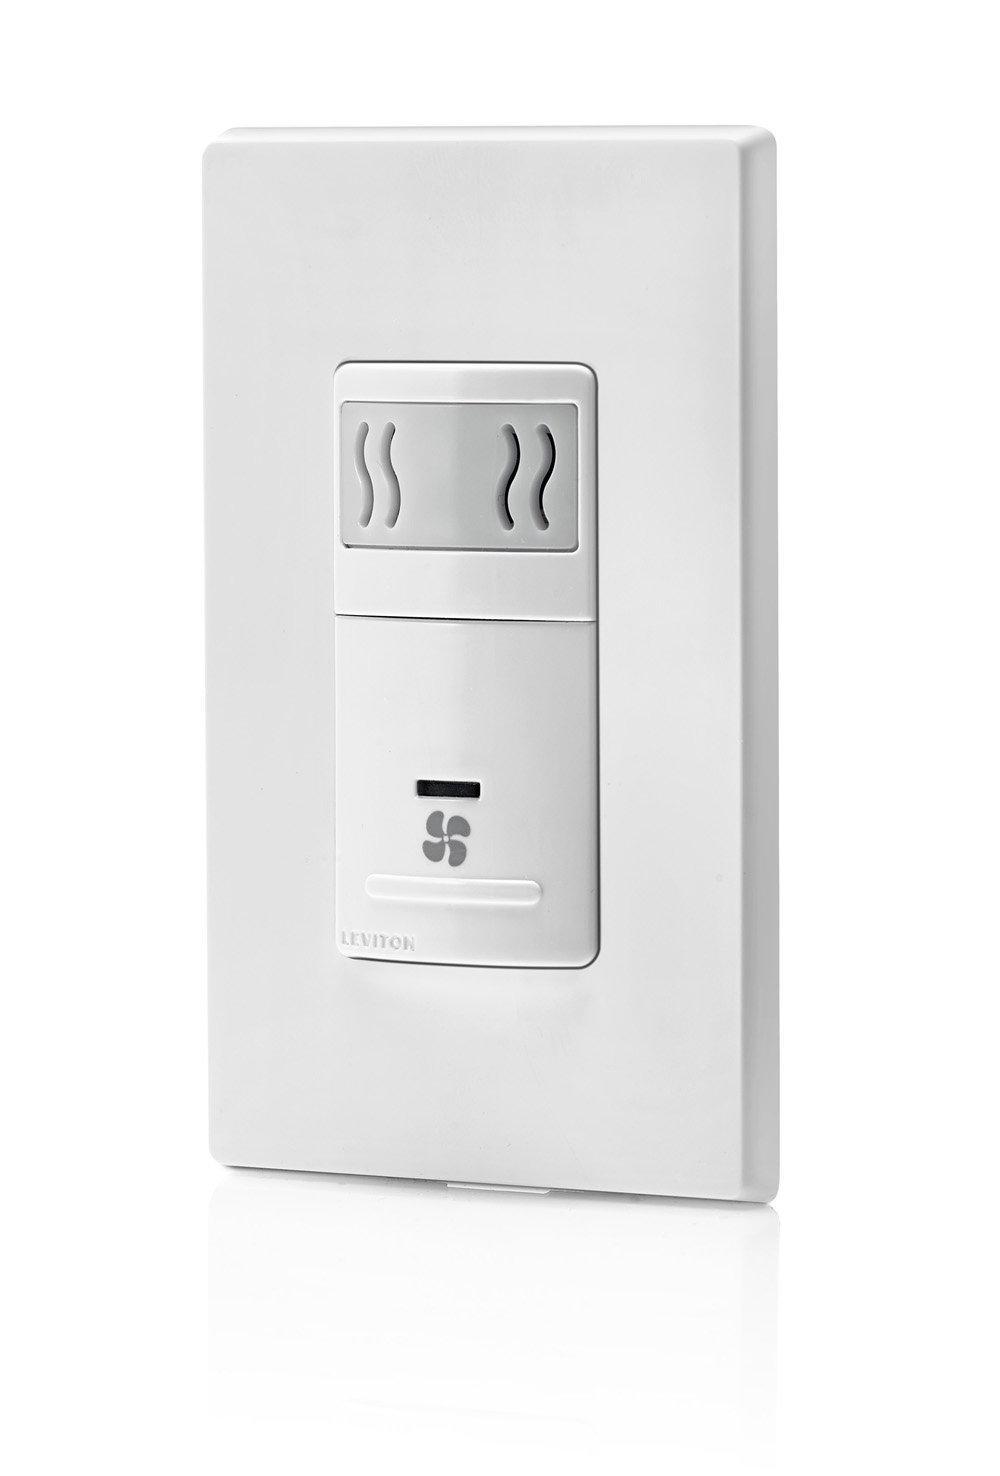 Leviton Iphs5 1lw Humidity Sensor And Fan Control Single